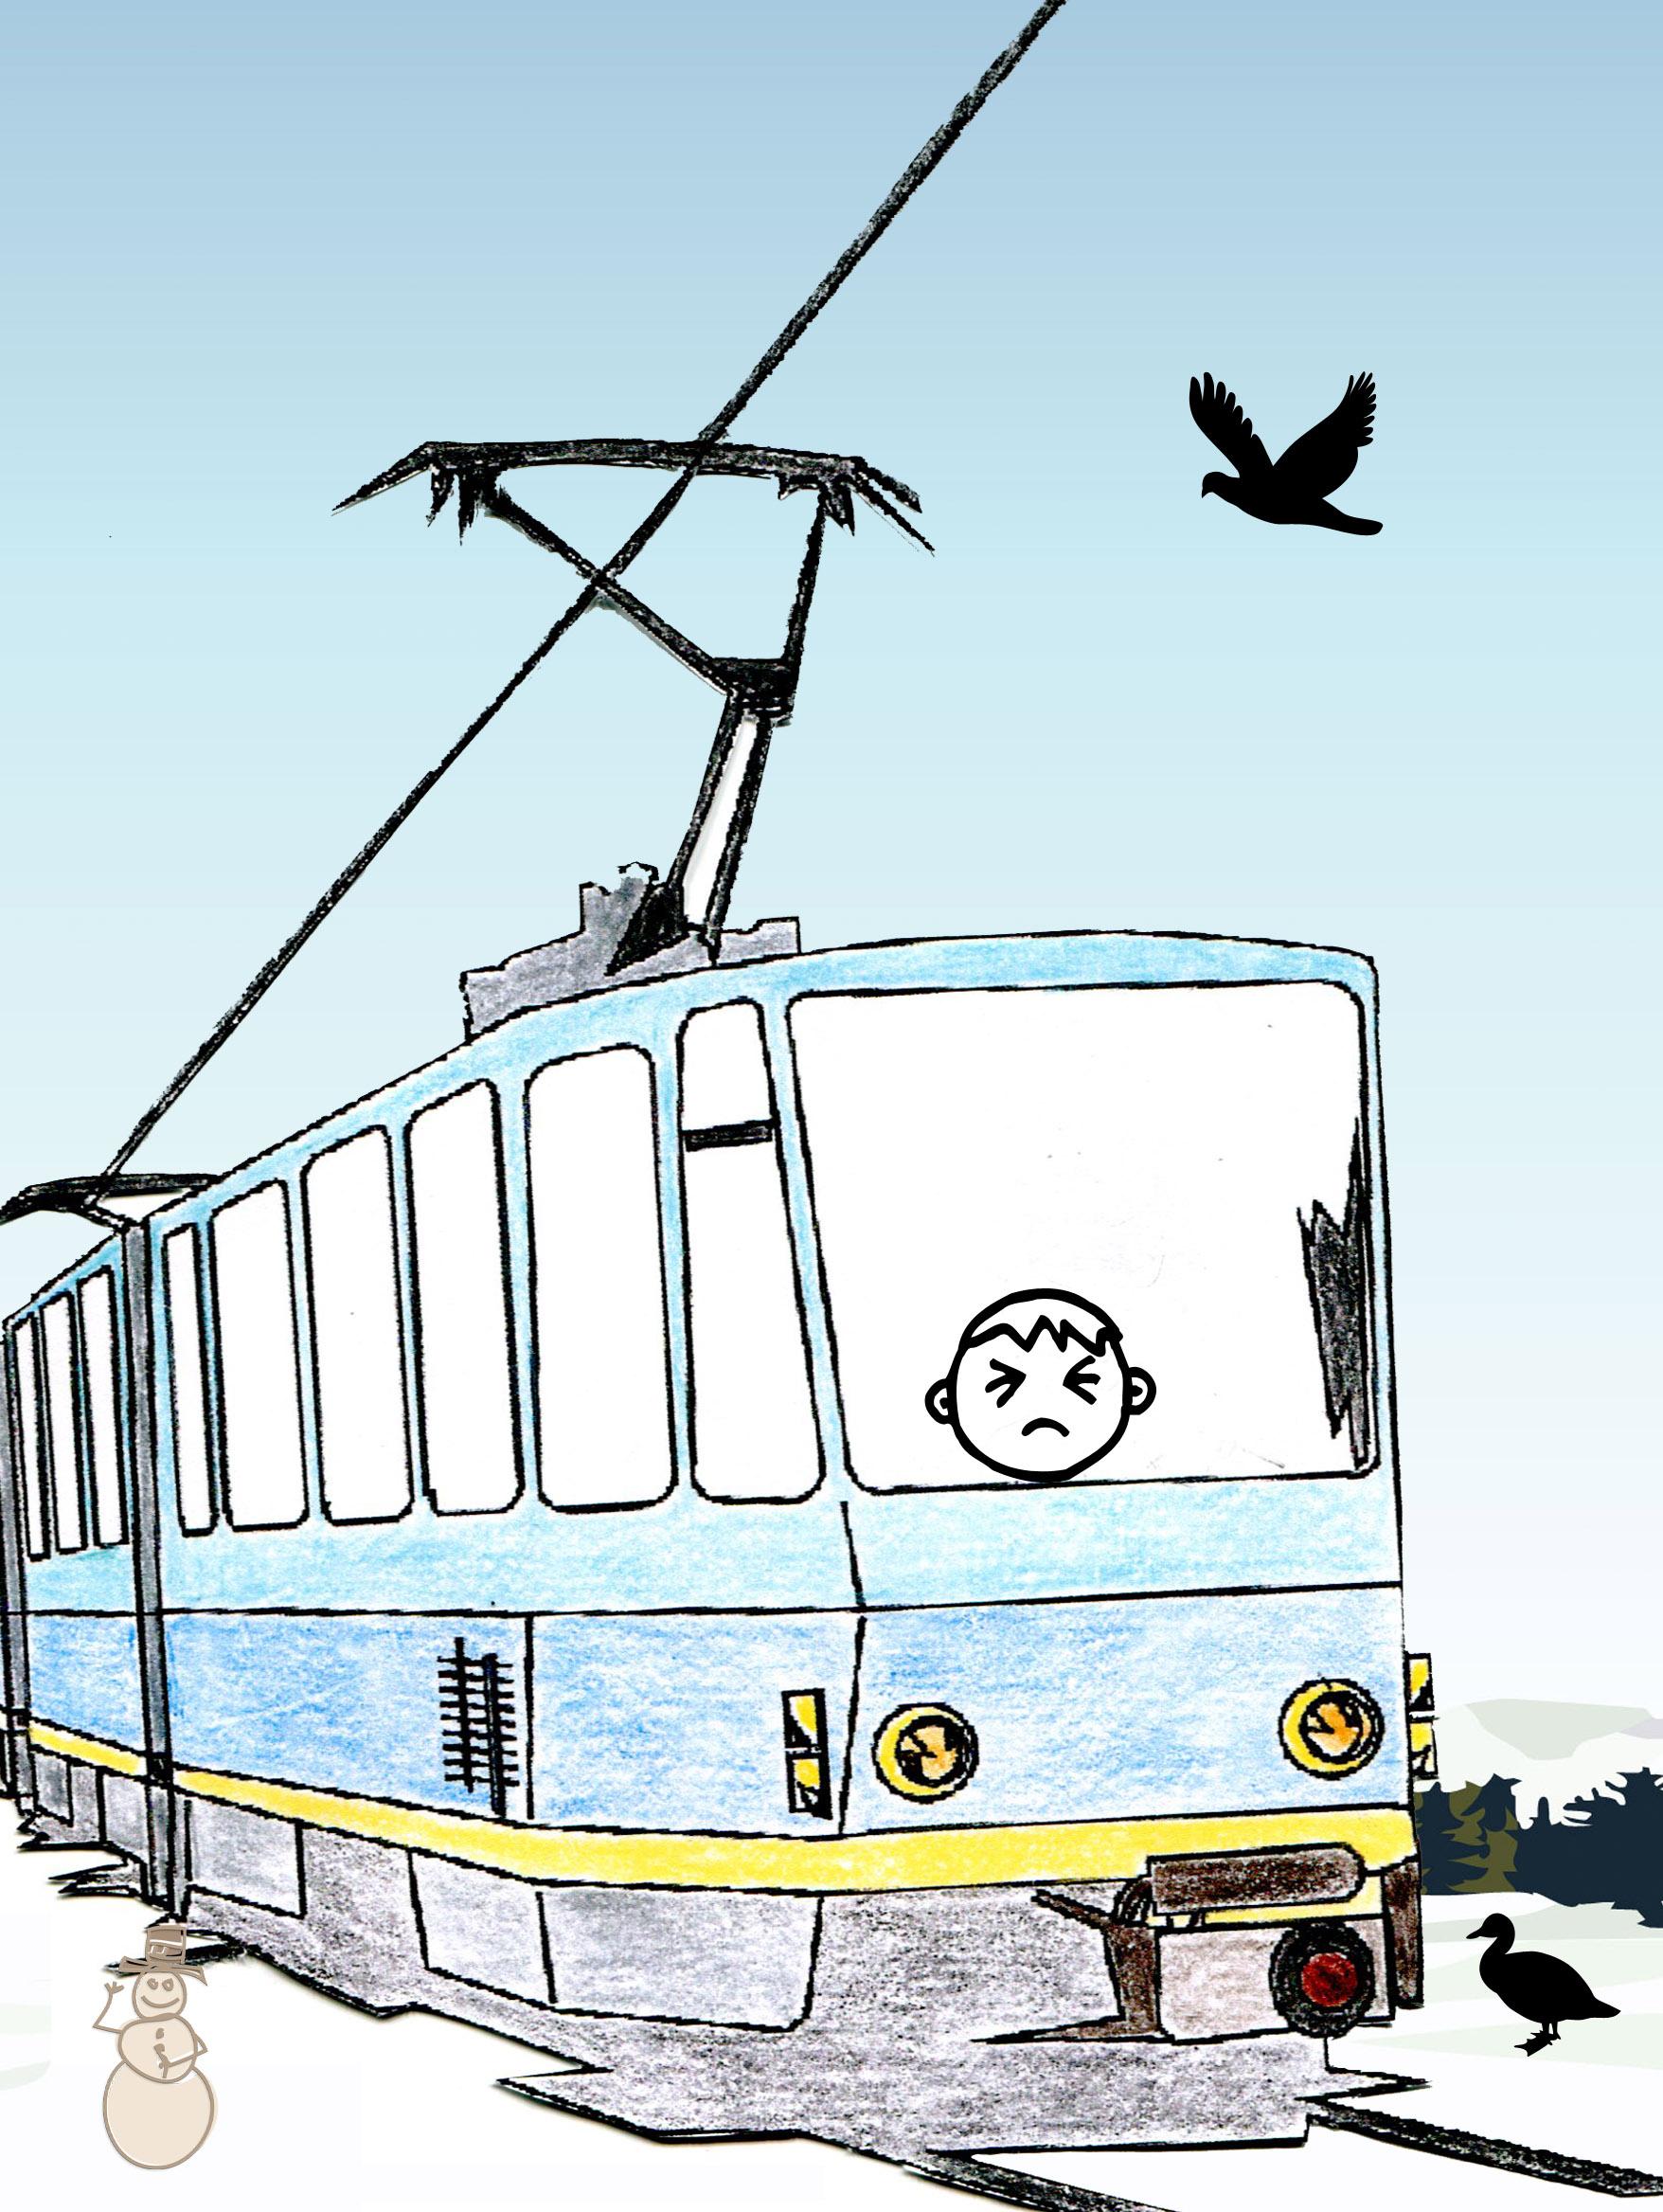 Le tram bleu